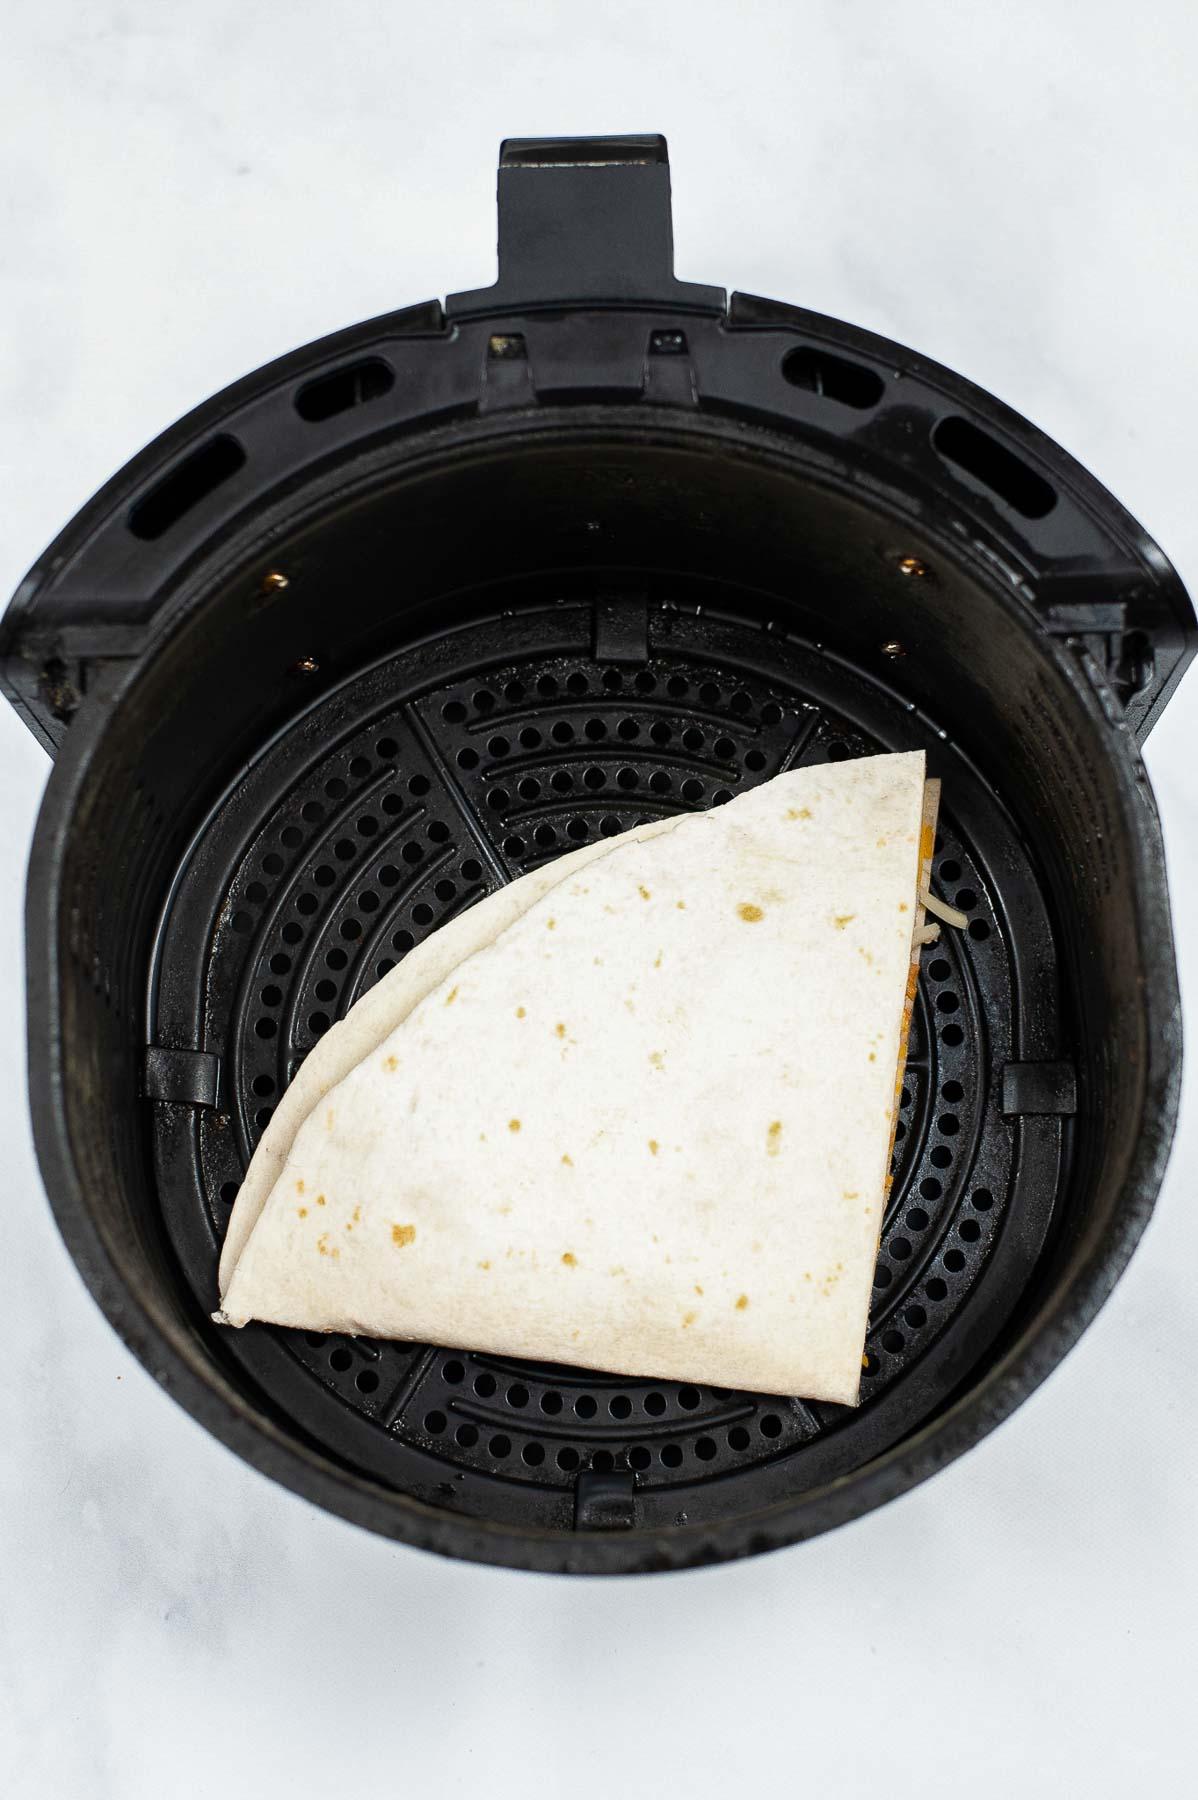 Making a quesadilla in an air fryer.